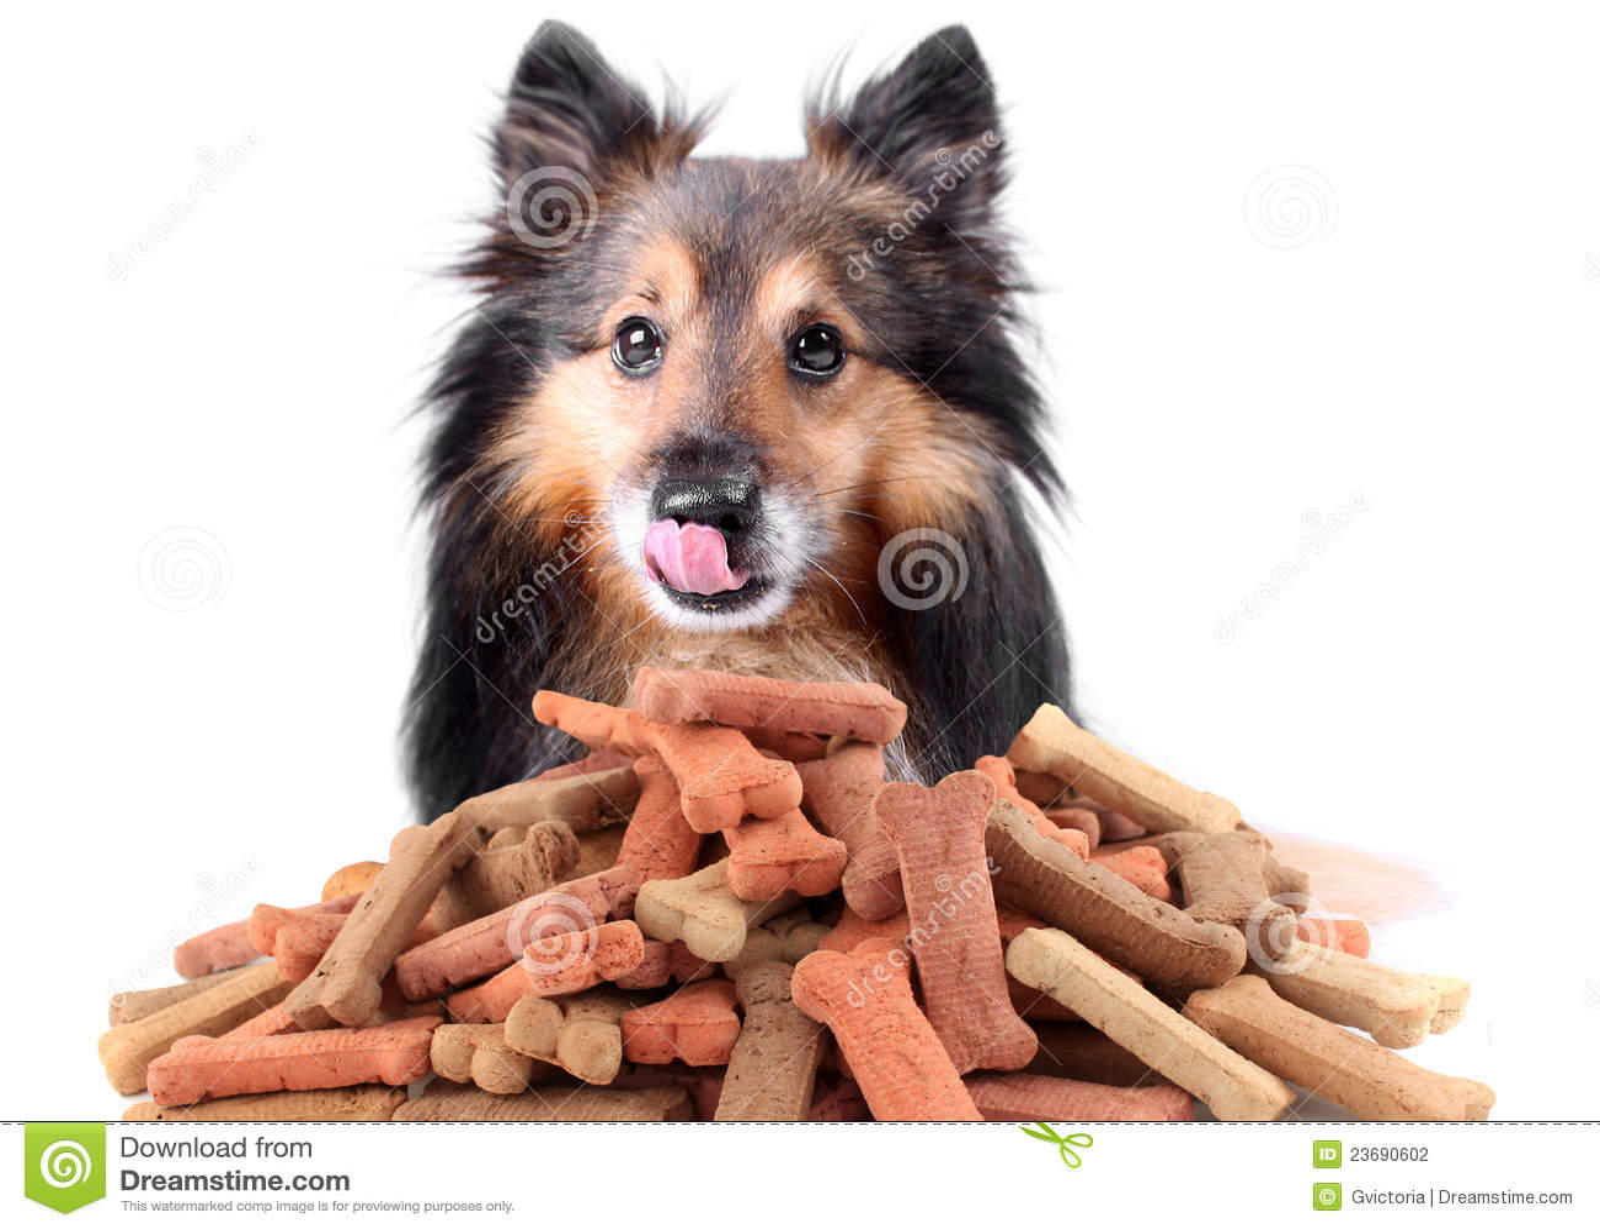 Kexhundsheltie